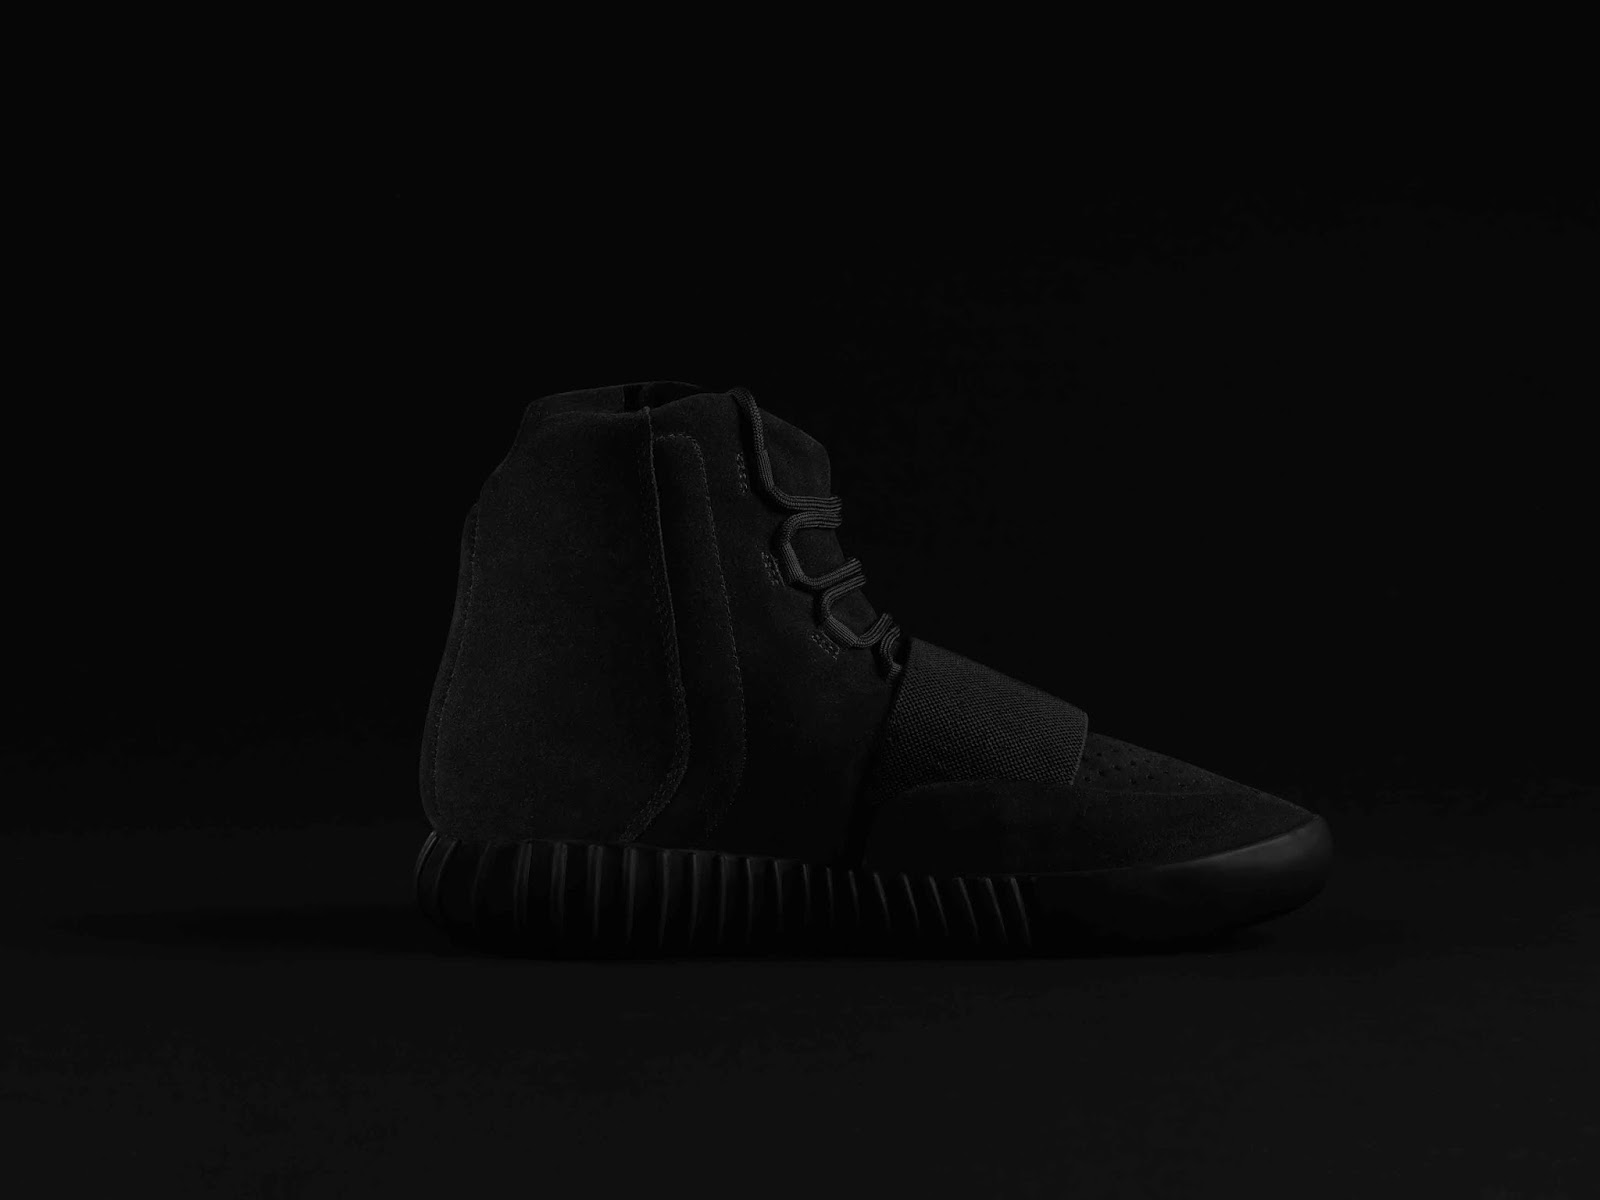 9b206b48435d adidas Originals by Kanye West - Yeezy Boost 750